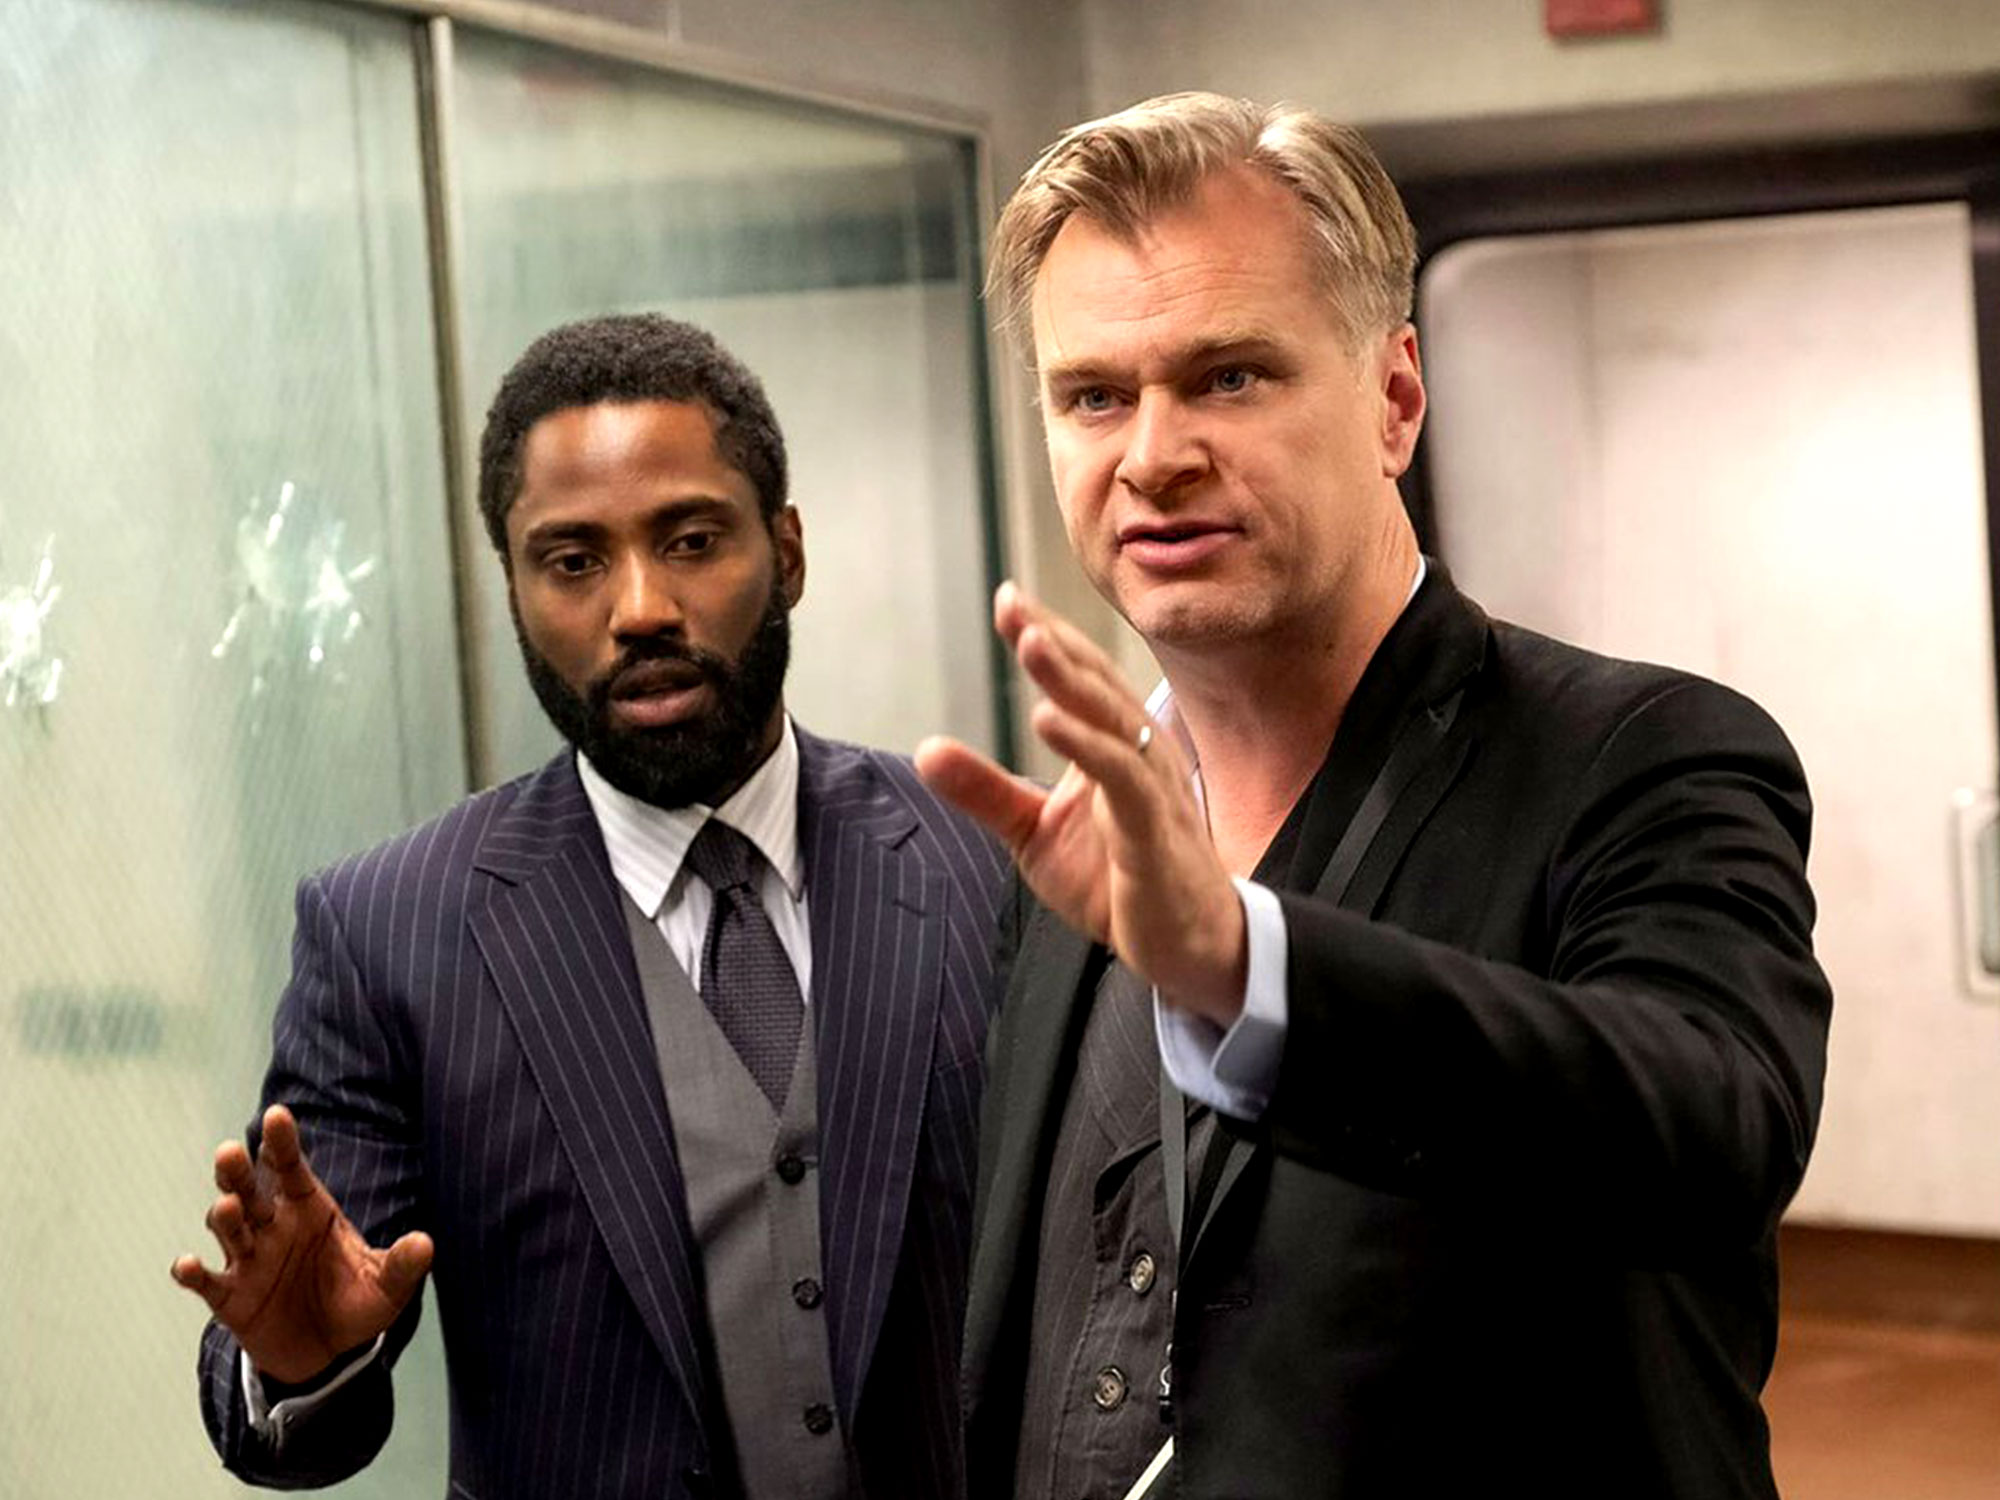 Christopher Nolan and John David Washington on the set of Tenet (2020)